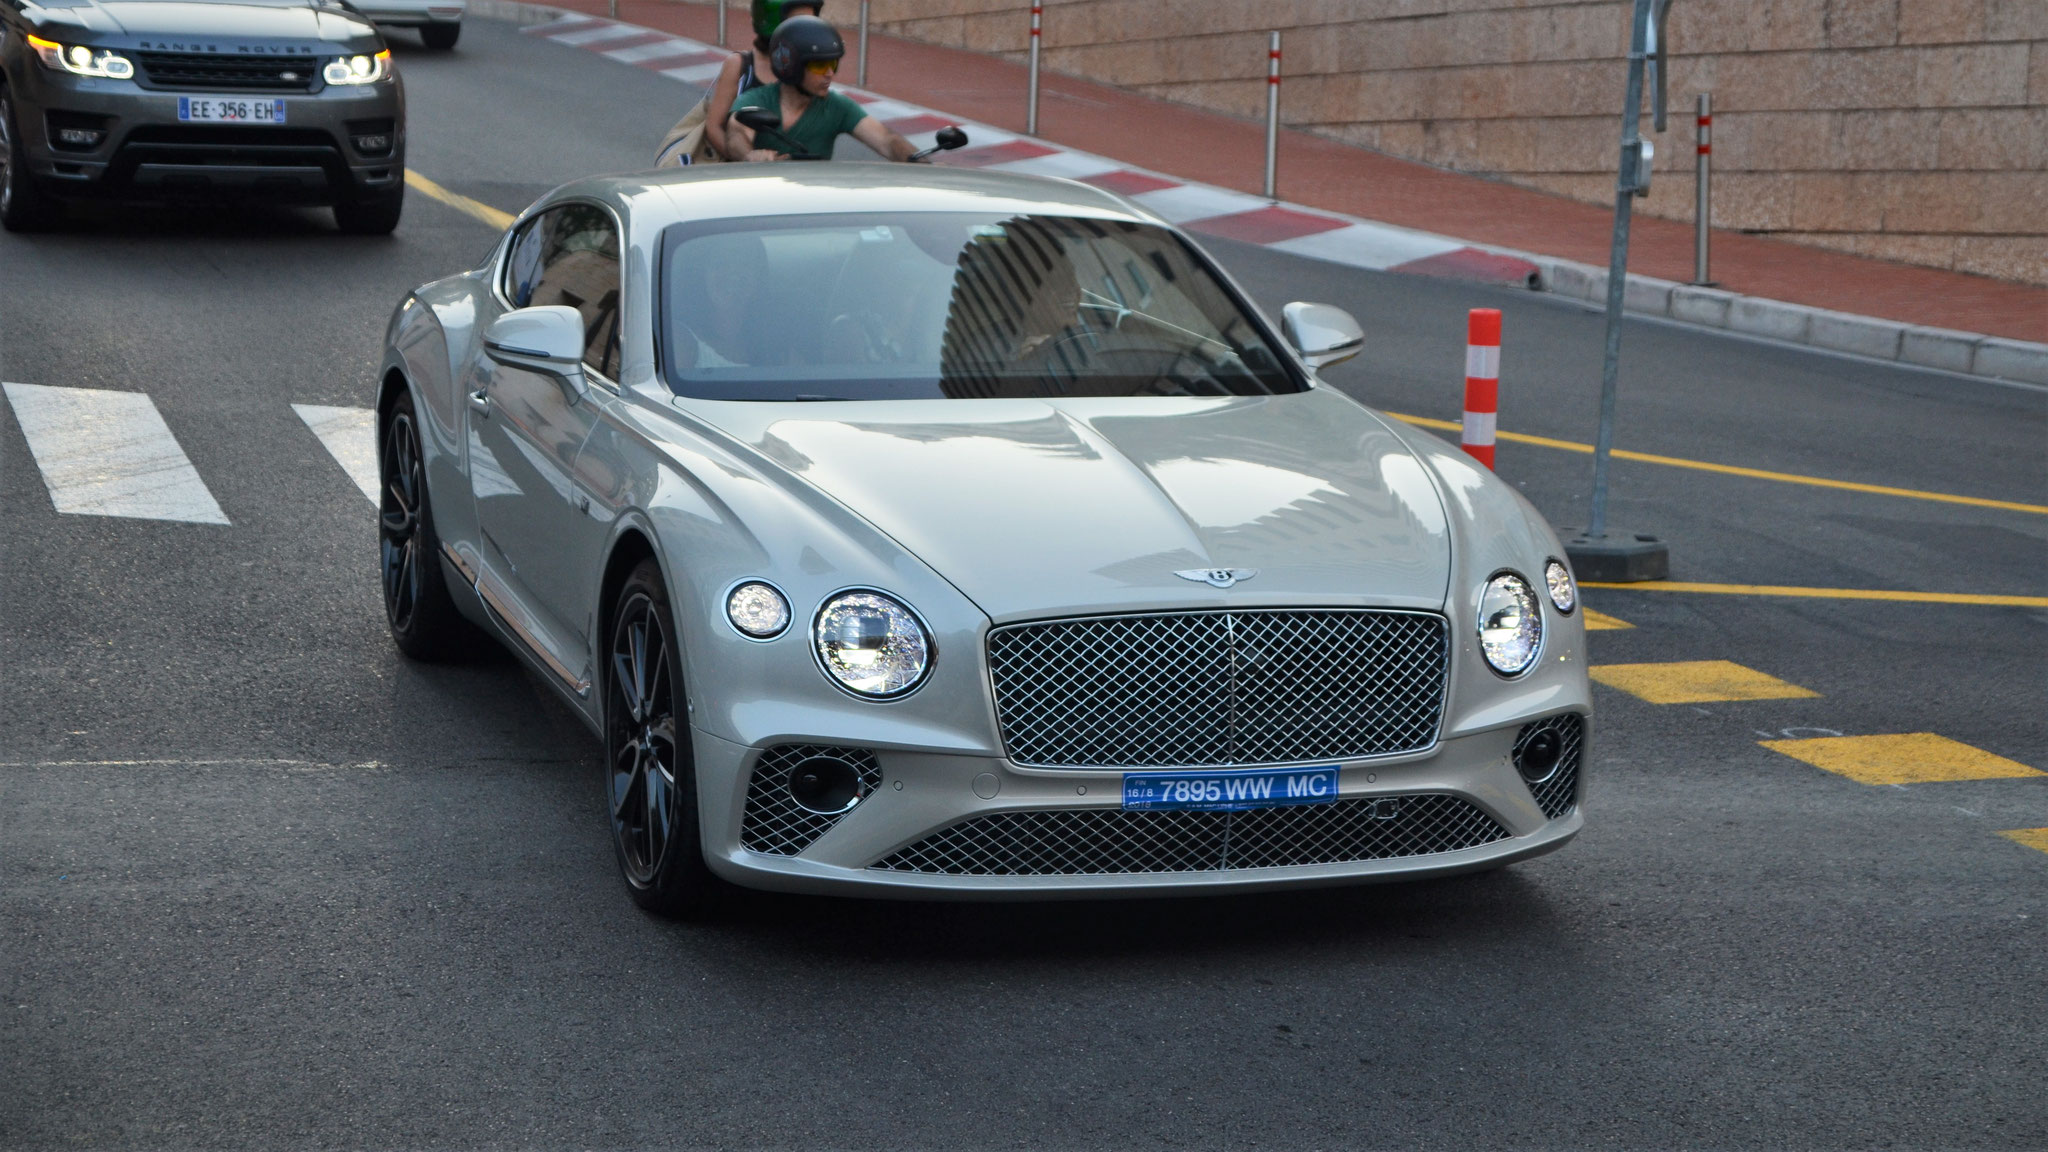 Bentley Continental GT - 7895-WW-MC (MC)